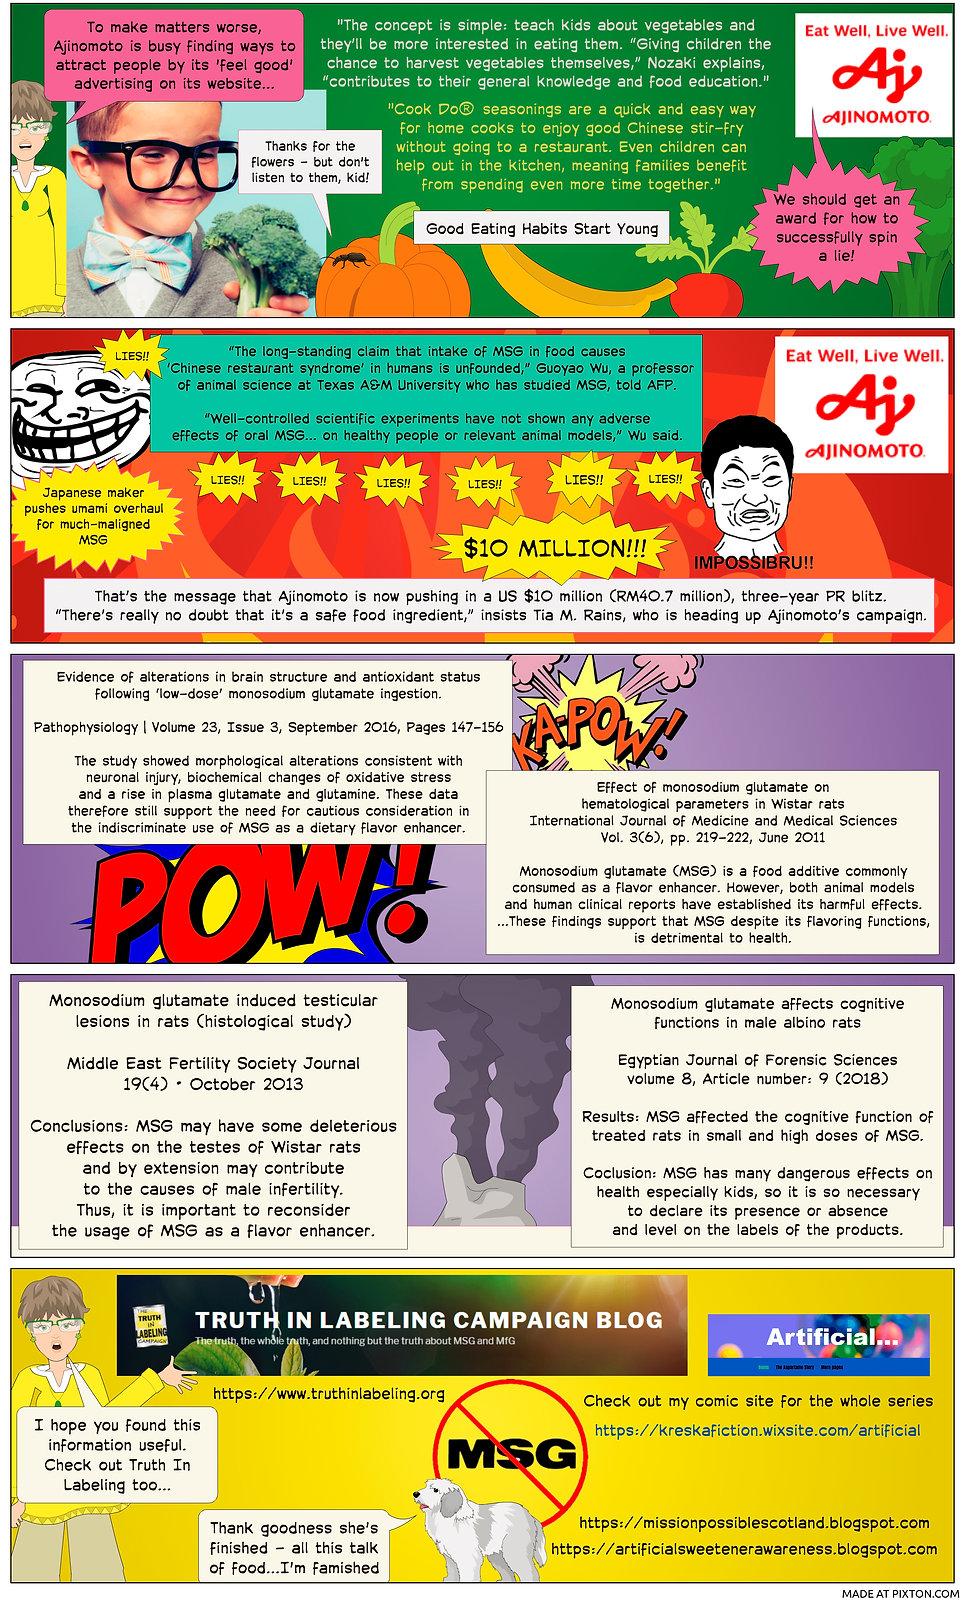 Pixton_Comic_MSG_and_Obesity_Part_Three_